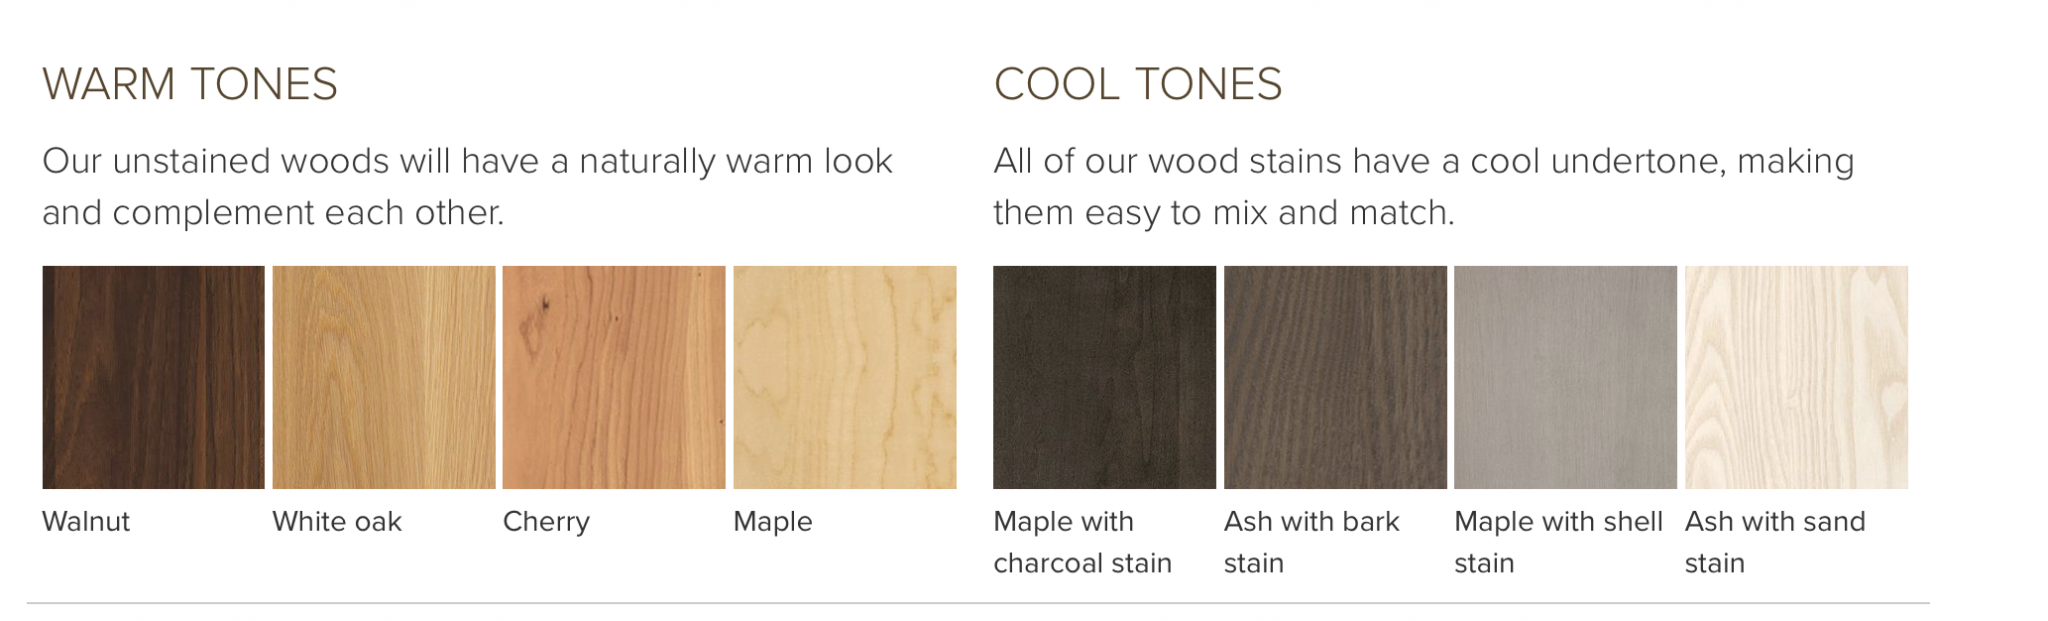 roomandboardwoodtones